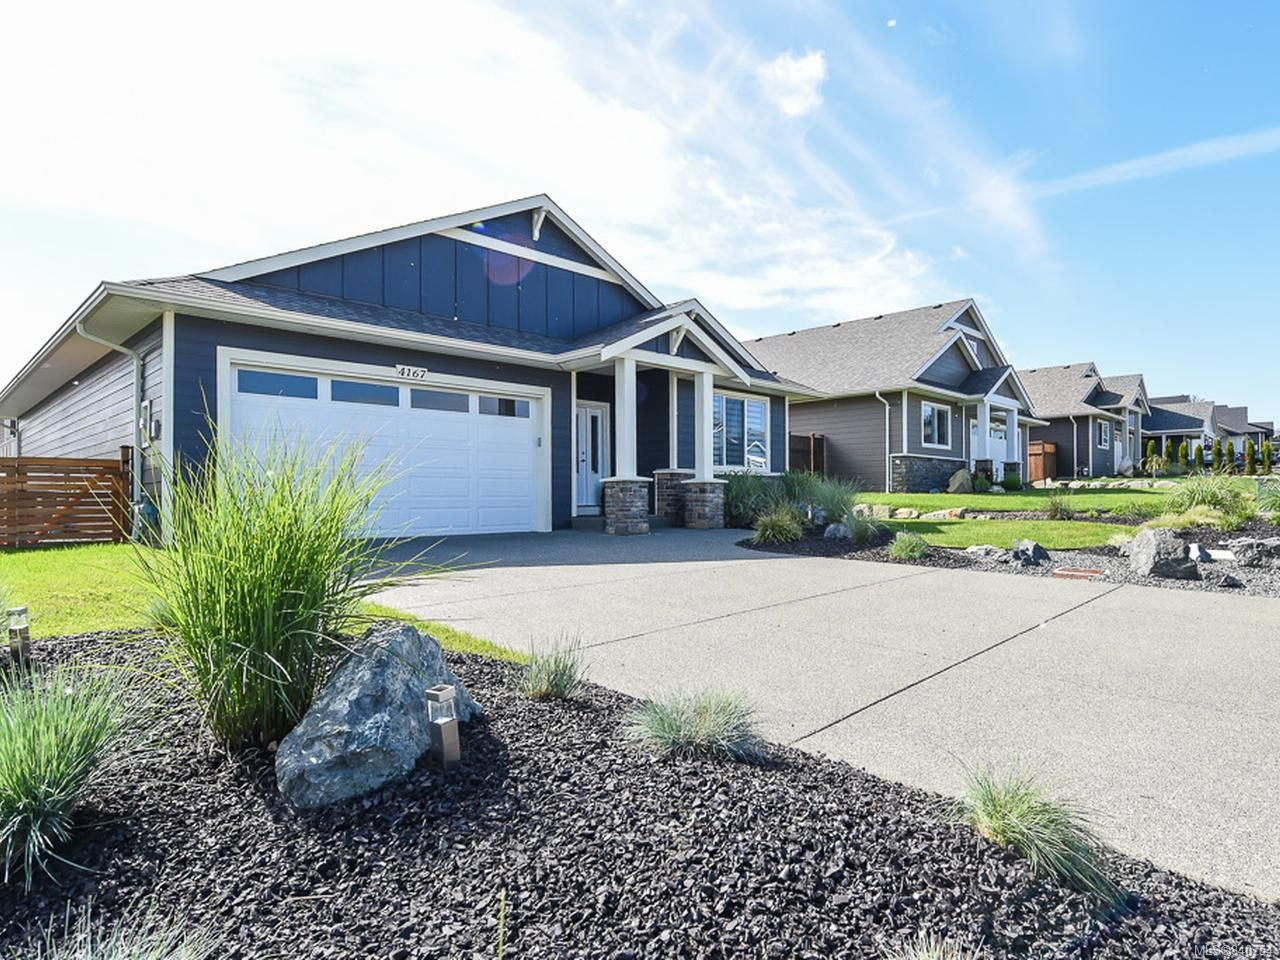 Main Photo: 4167 Chancellor Cres in COURTENAY: CV Courtenay City House for sale (Comox Valley)  : MLS®# 840754